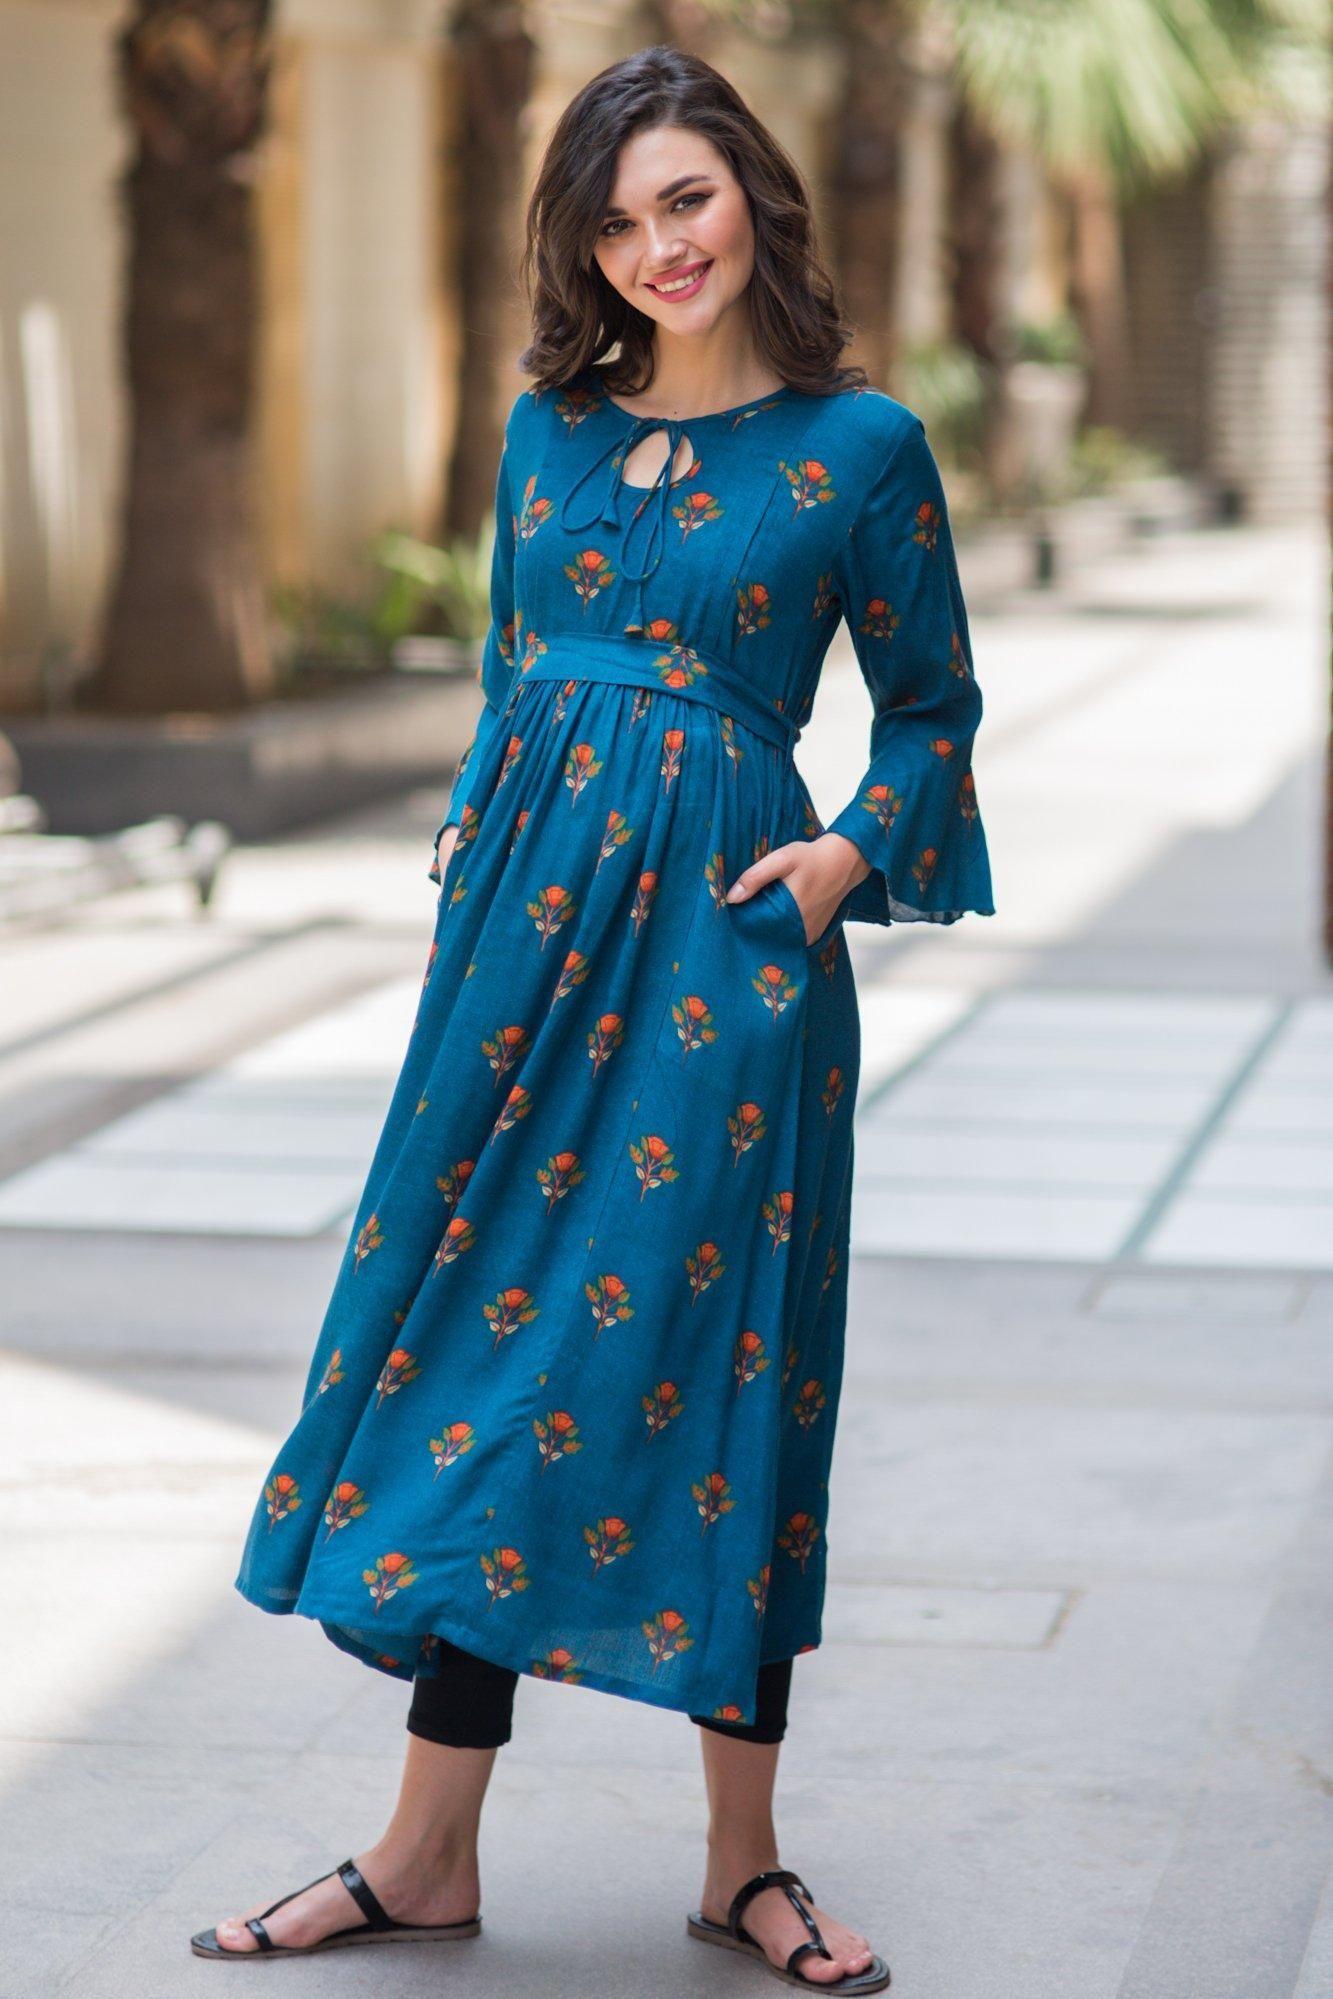 aa6b3bff69303 Buy online Momzjoy maternity dresses, pregnancy wear, nursing clothes, –  MOMZJOY.COM